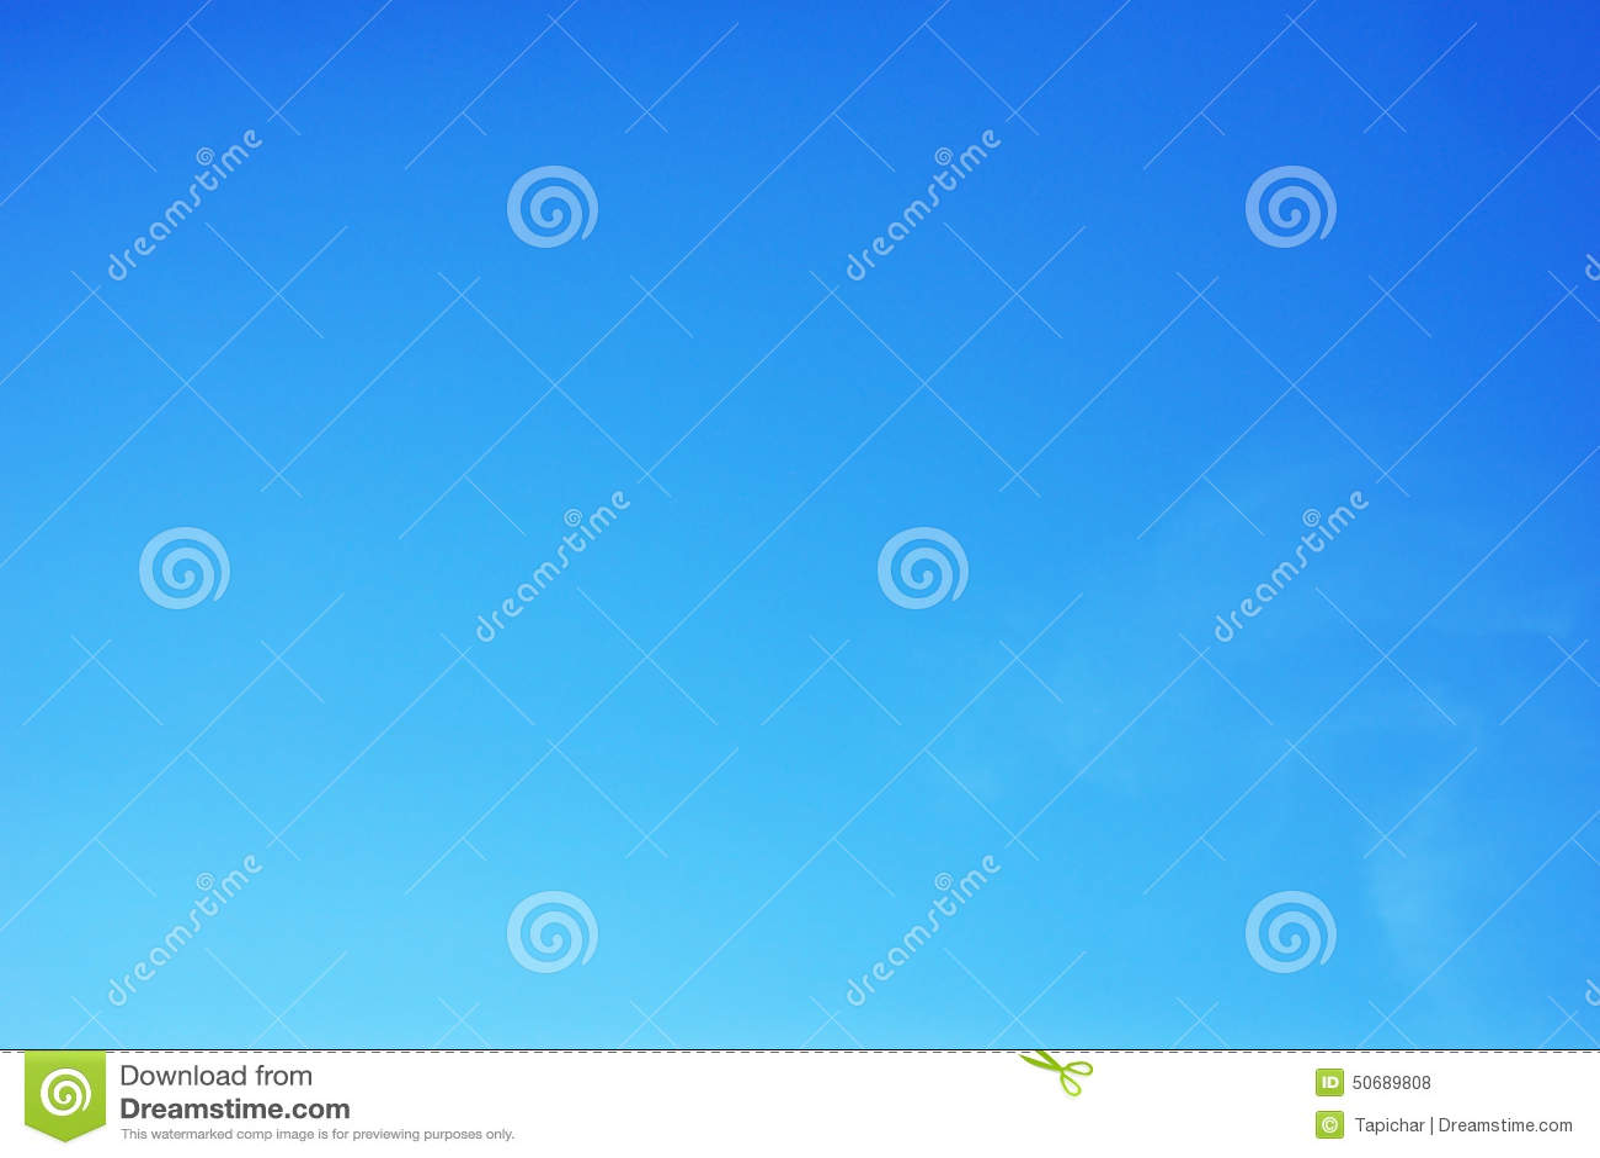 Download 蓝天 库存照片. 图片 包括有 地图集, 背包, 天空, 蓝色, 新鲜, beautifuler, 颜色 - 50689808